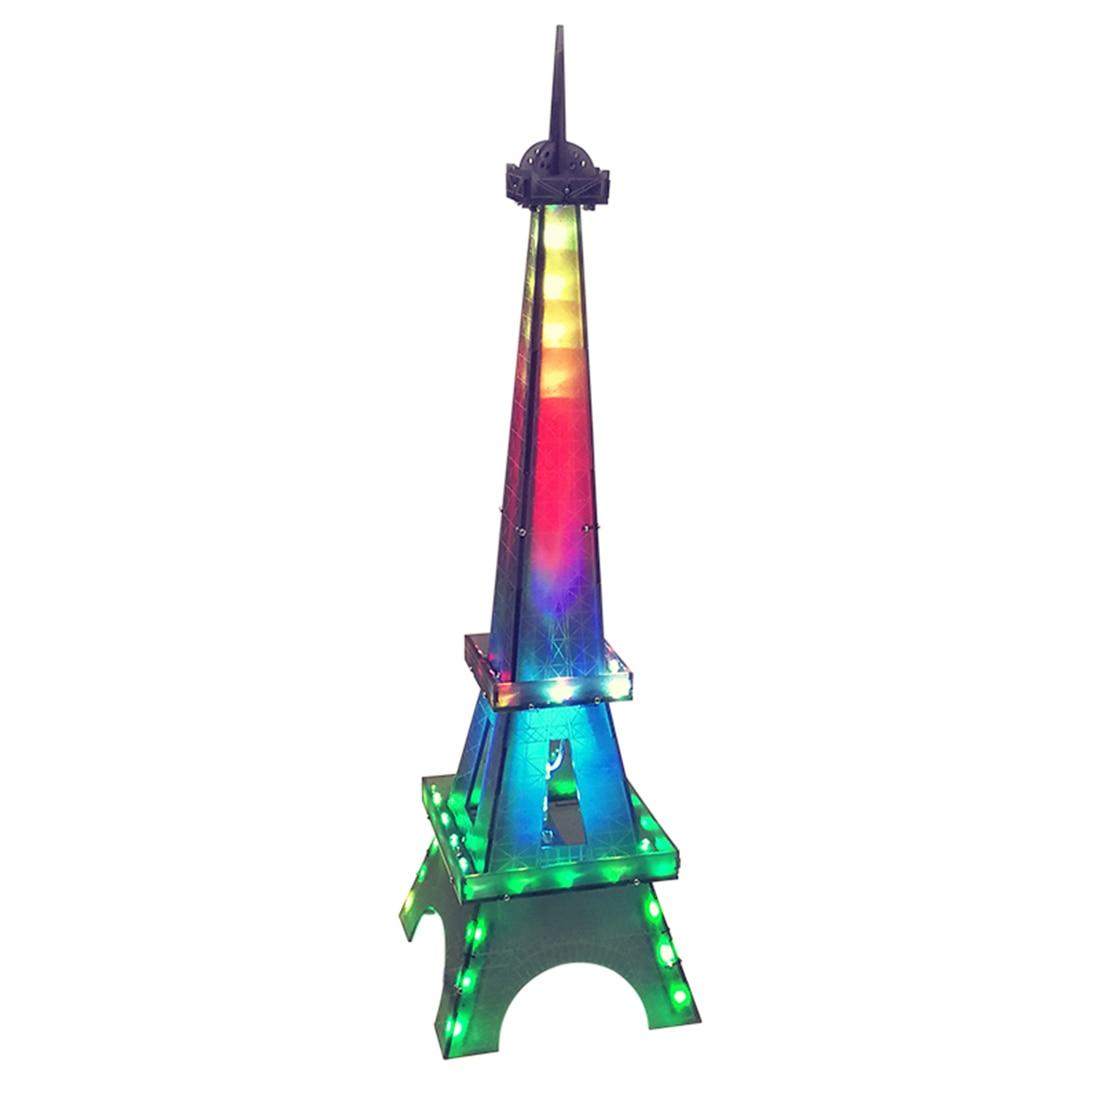 DIY LED Display Lamp DIY Welding Light Kits DIY Lamp Brain-Training Toy For Children Education Toys Birthday Gift - Eiffel Tower